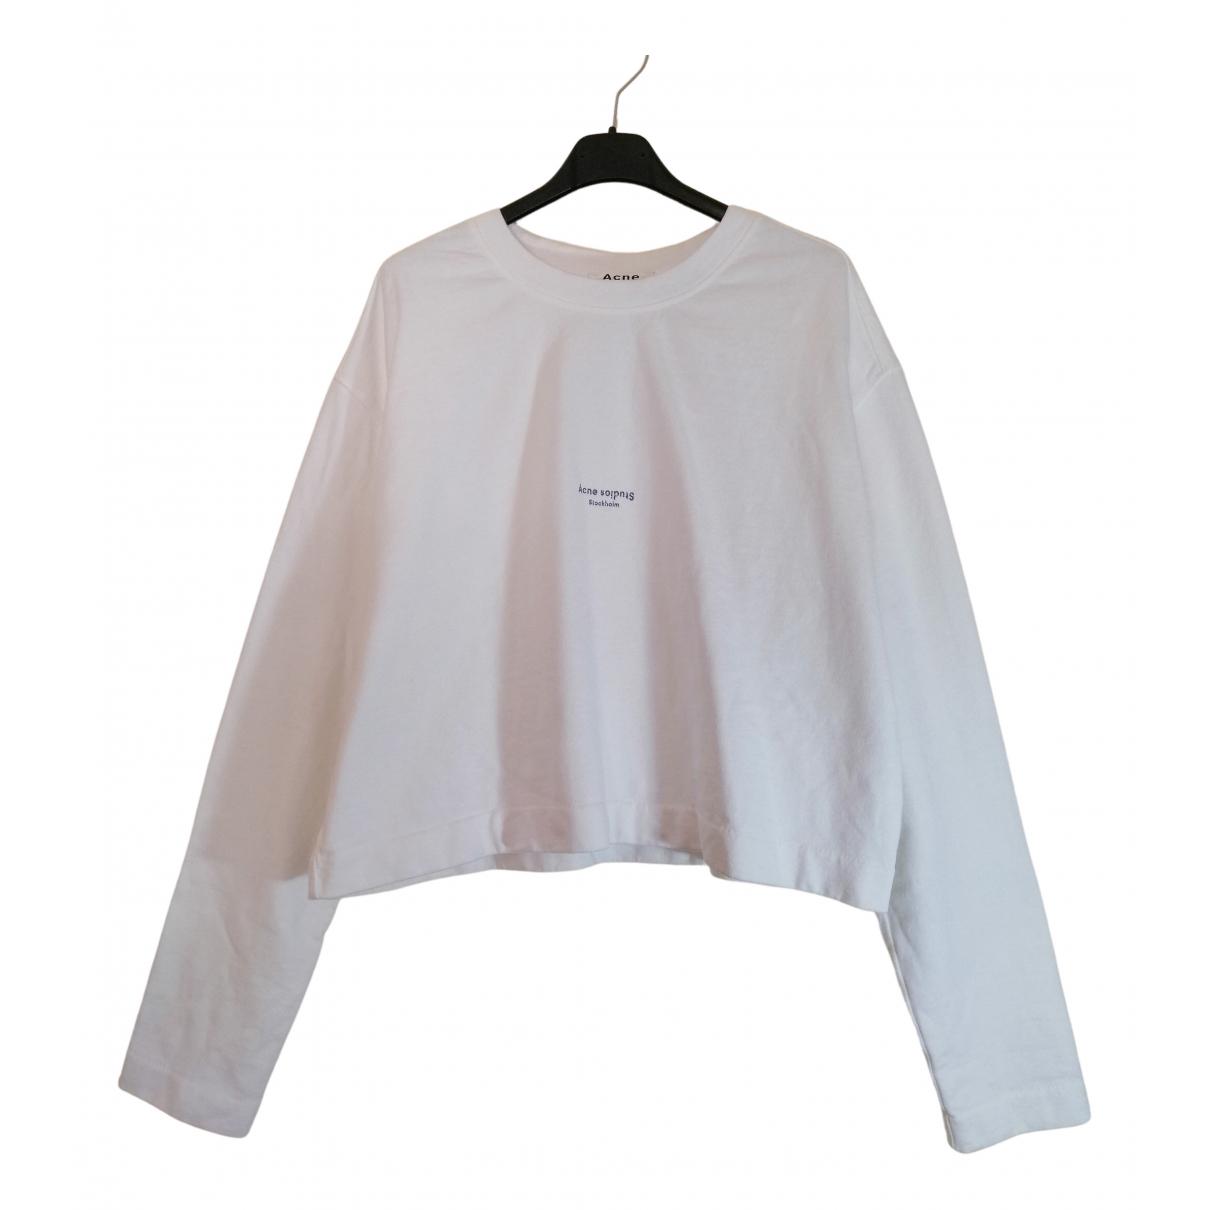 Acne Studios \N White Cotton Knitwear for Women M International